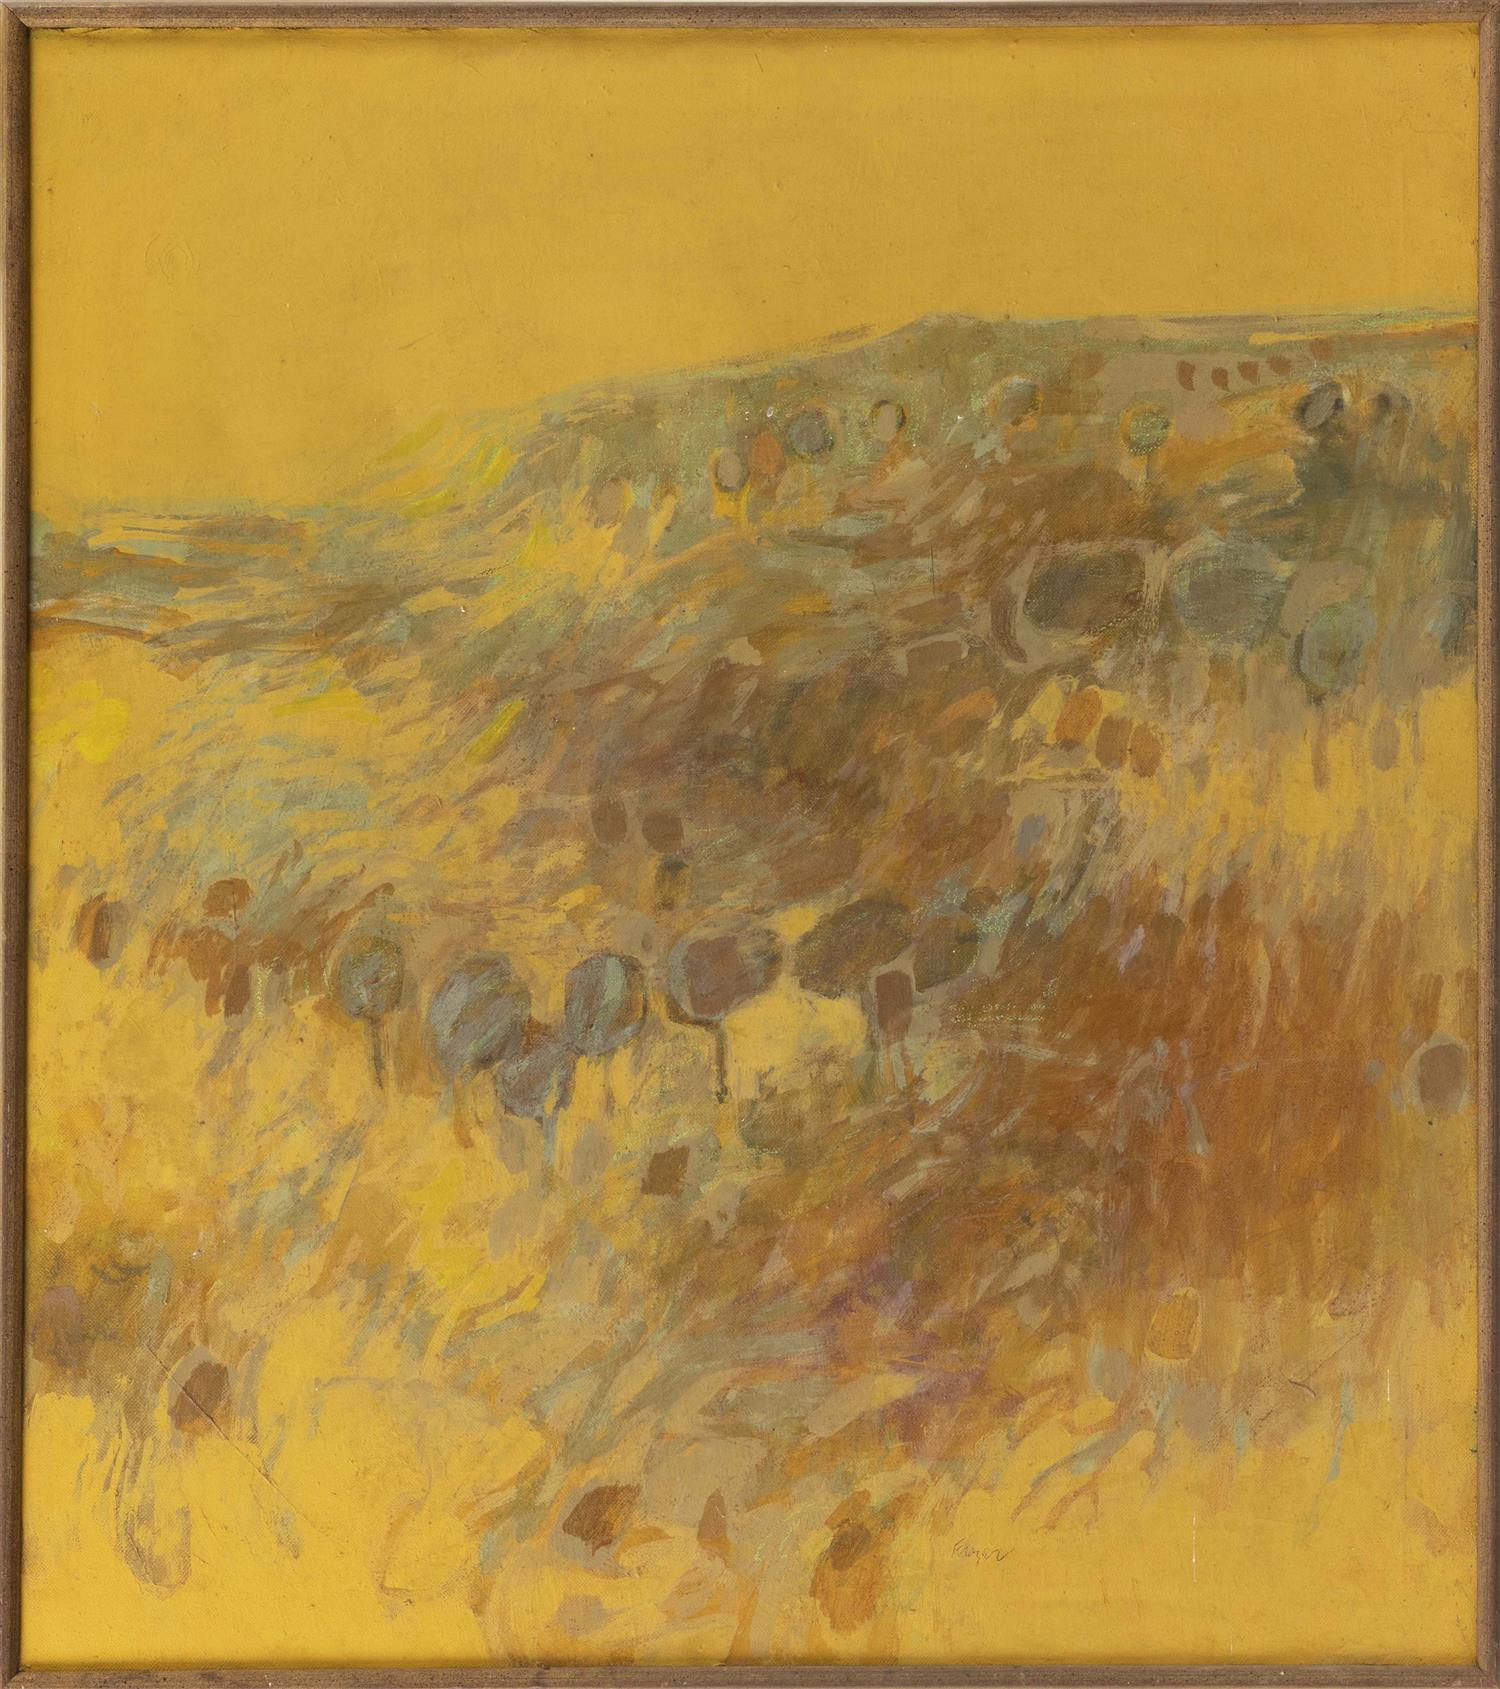 "JOHN THATCHER FRAZER, Connecticut/Ohio, b. 1932, Hillside abstract., Oil on canvas, 32"" x 28"". Framed 34"" x 29""."